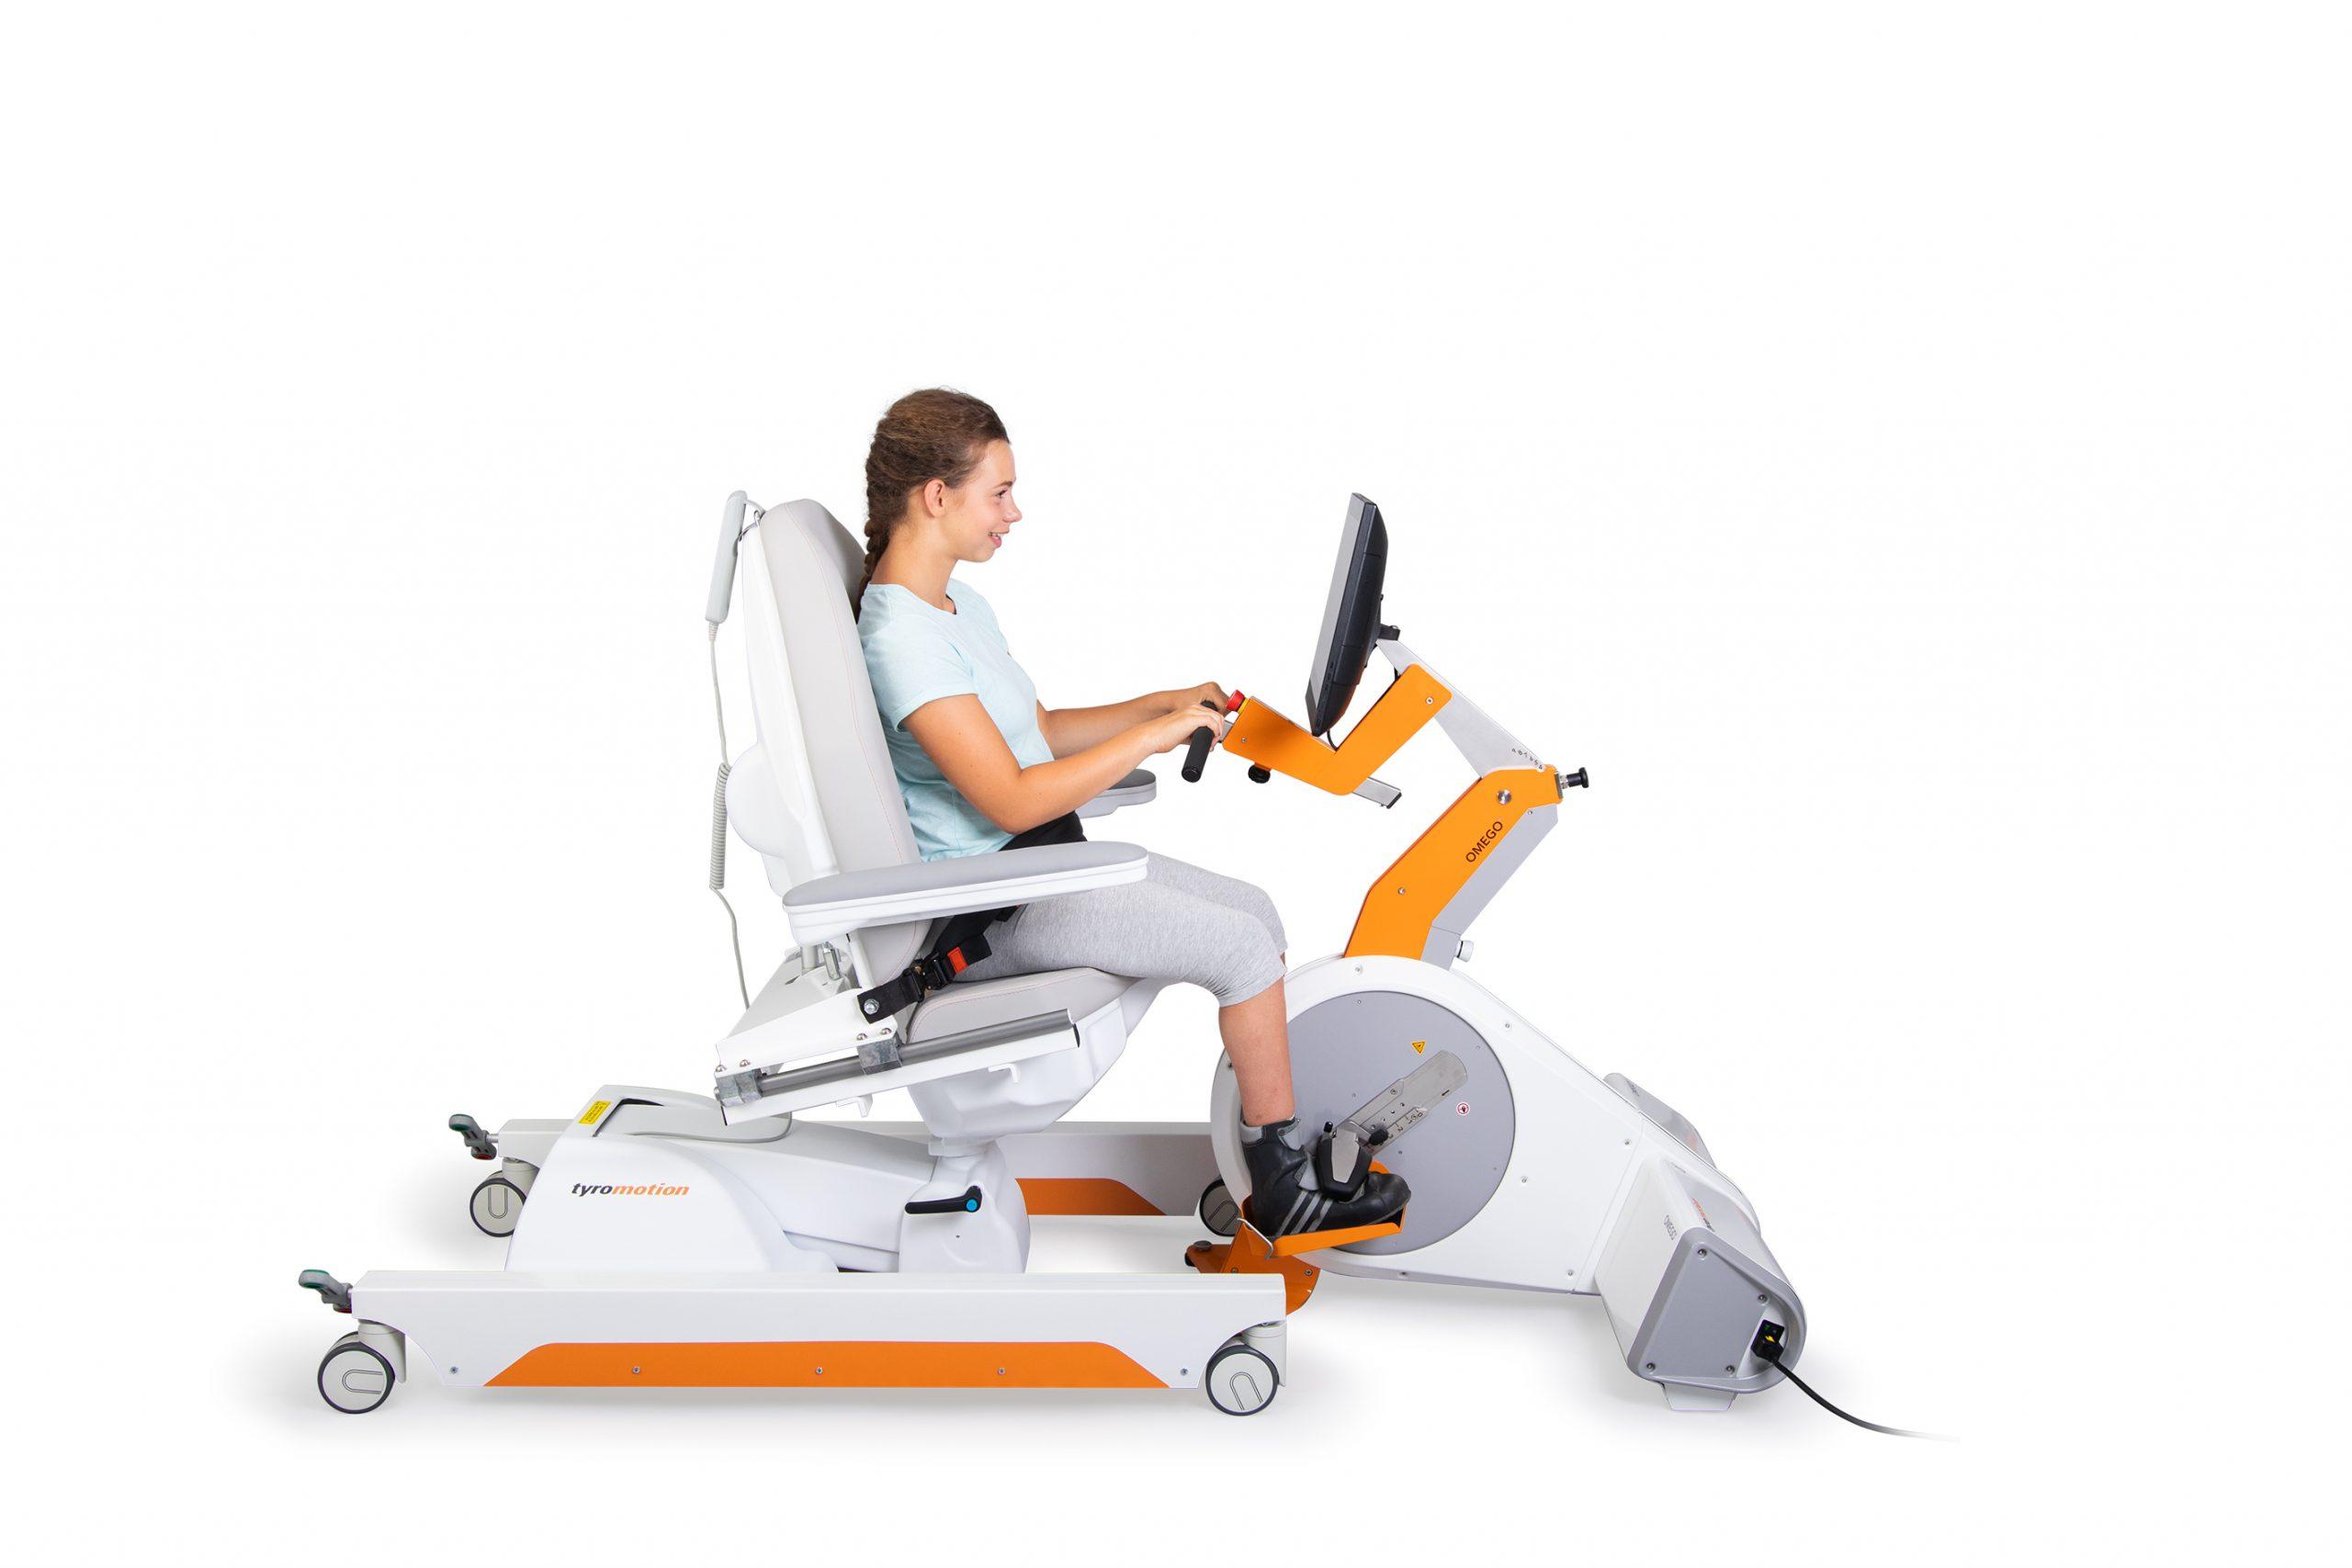 OMEGO robotic gait trainer